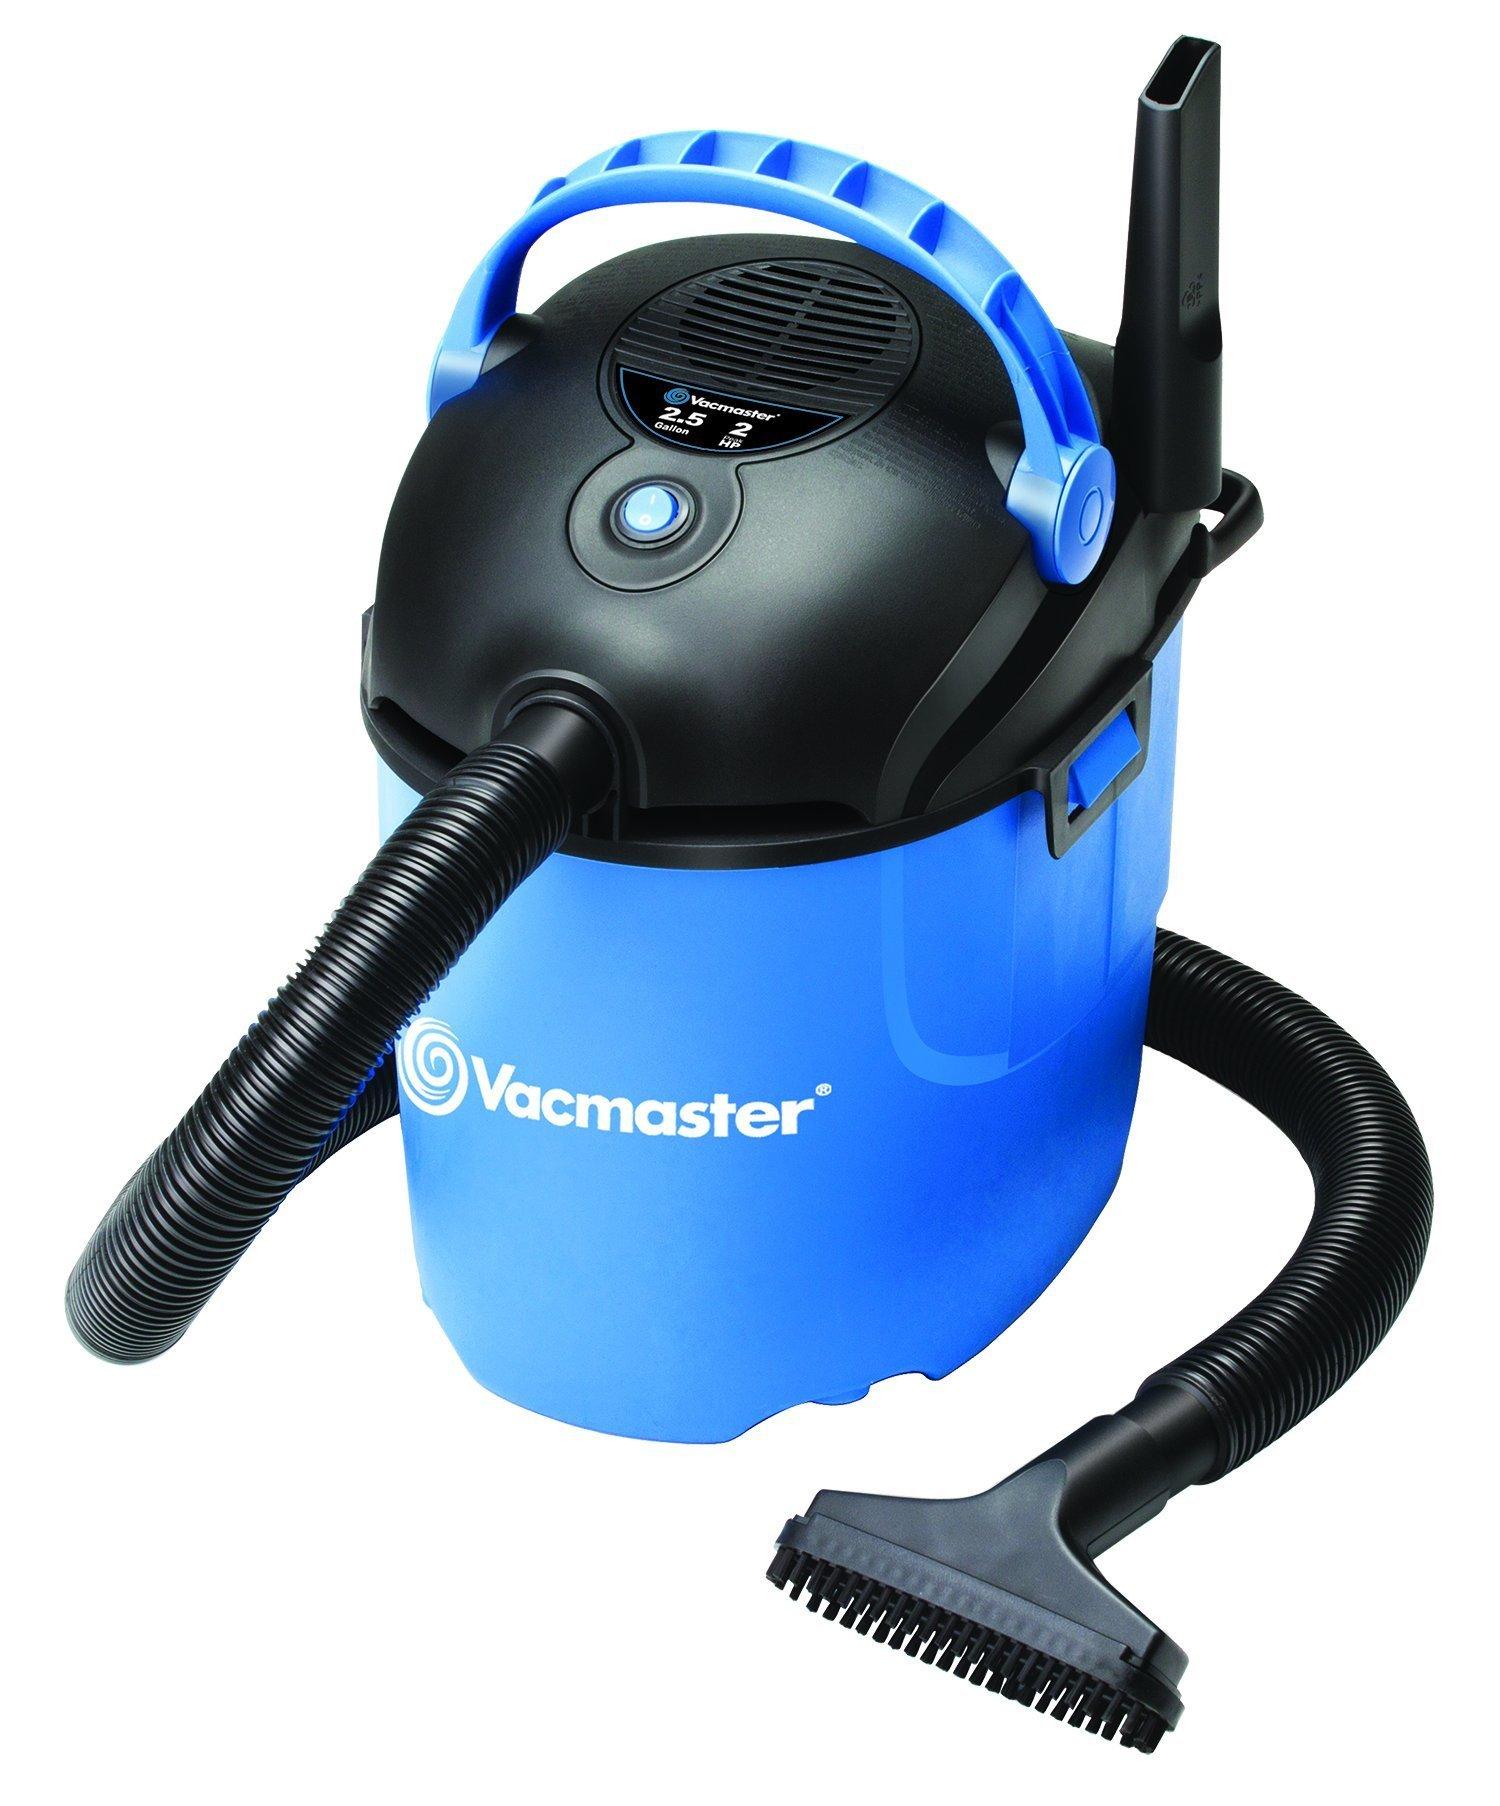 Vacmaster 2.5 Gallon, 2 Peak HP, Portable Wet/Dry Vacuum, VP205 (Renewed)